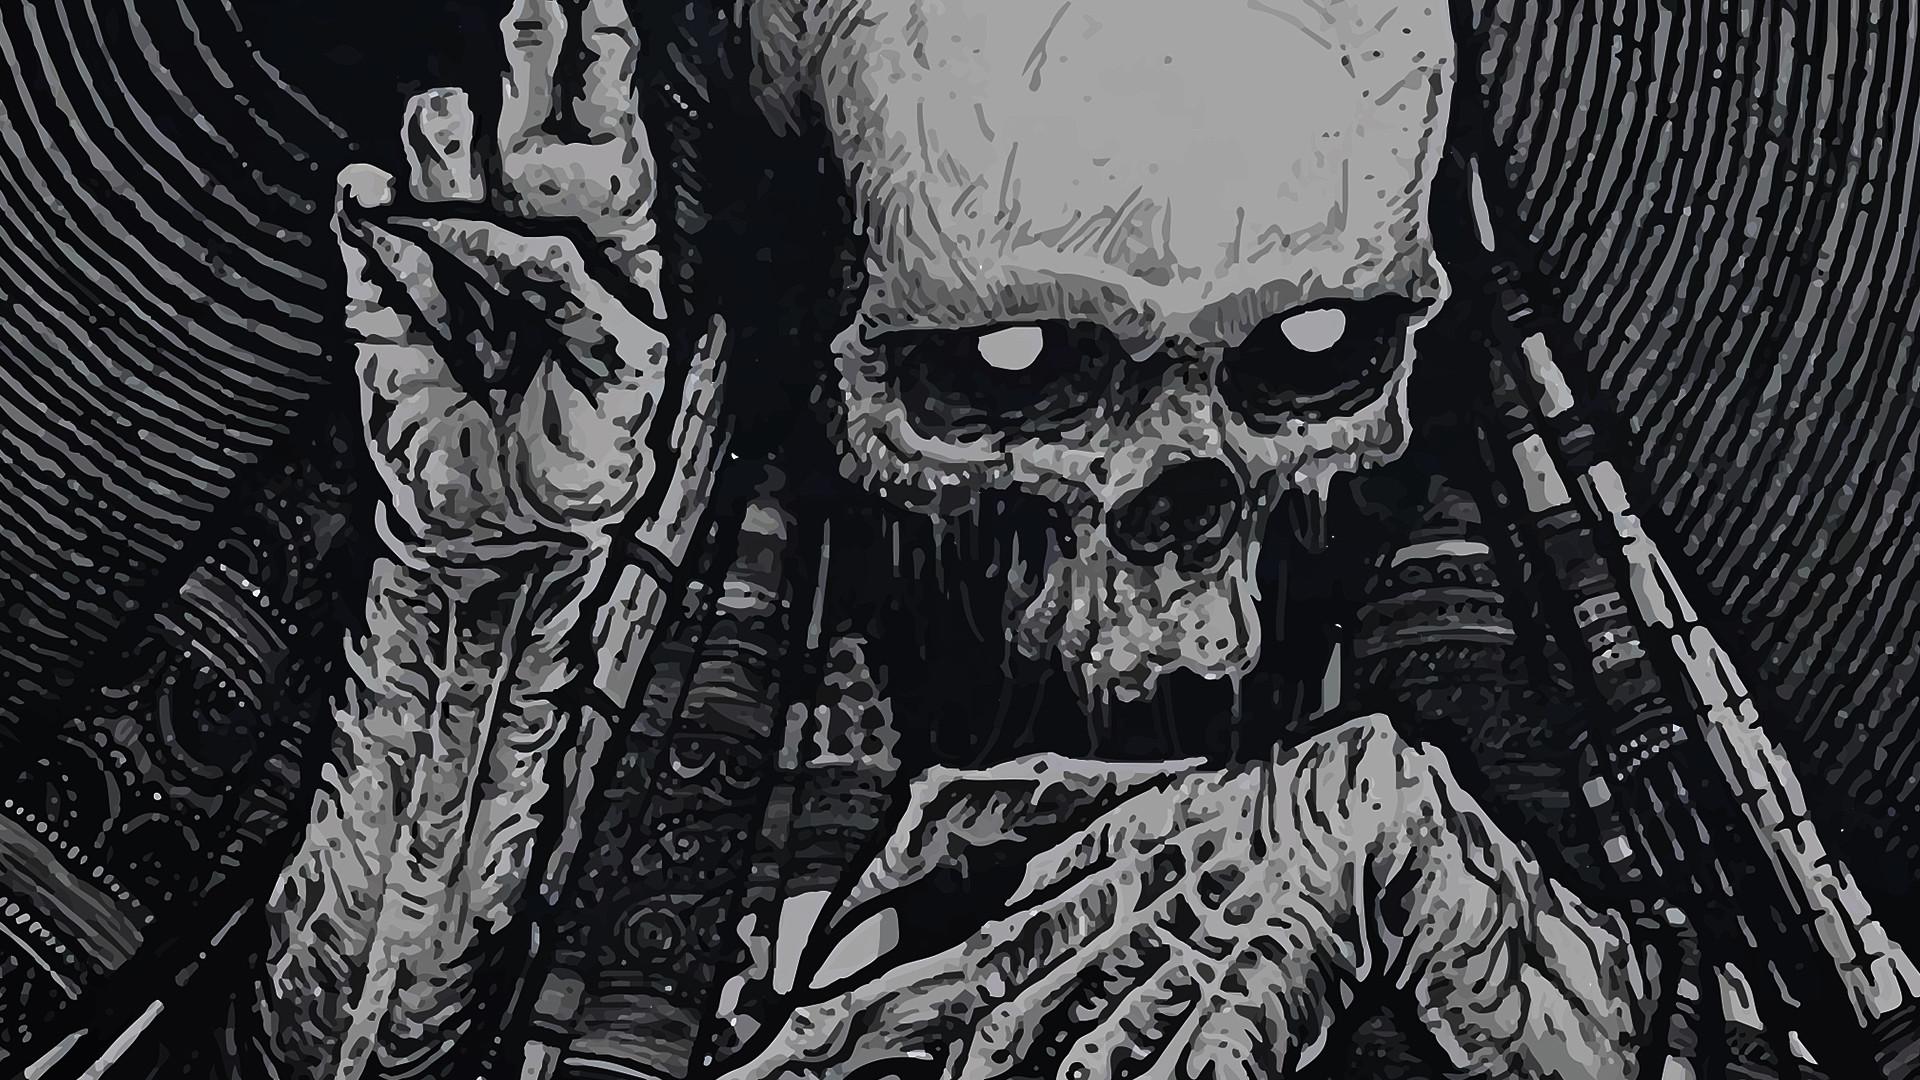 Res: 1920x1080, Dark fantast skeleton skull occult horror creepy spooky scary halloween  wallpaper      27791   WallpaperUP